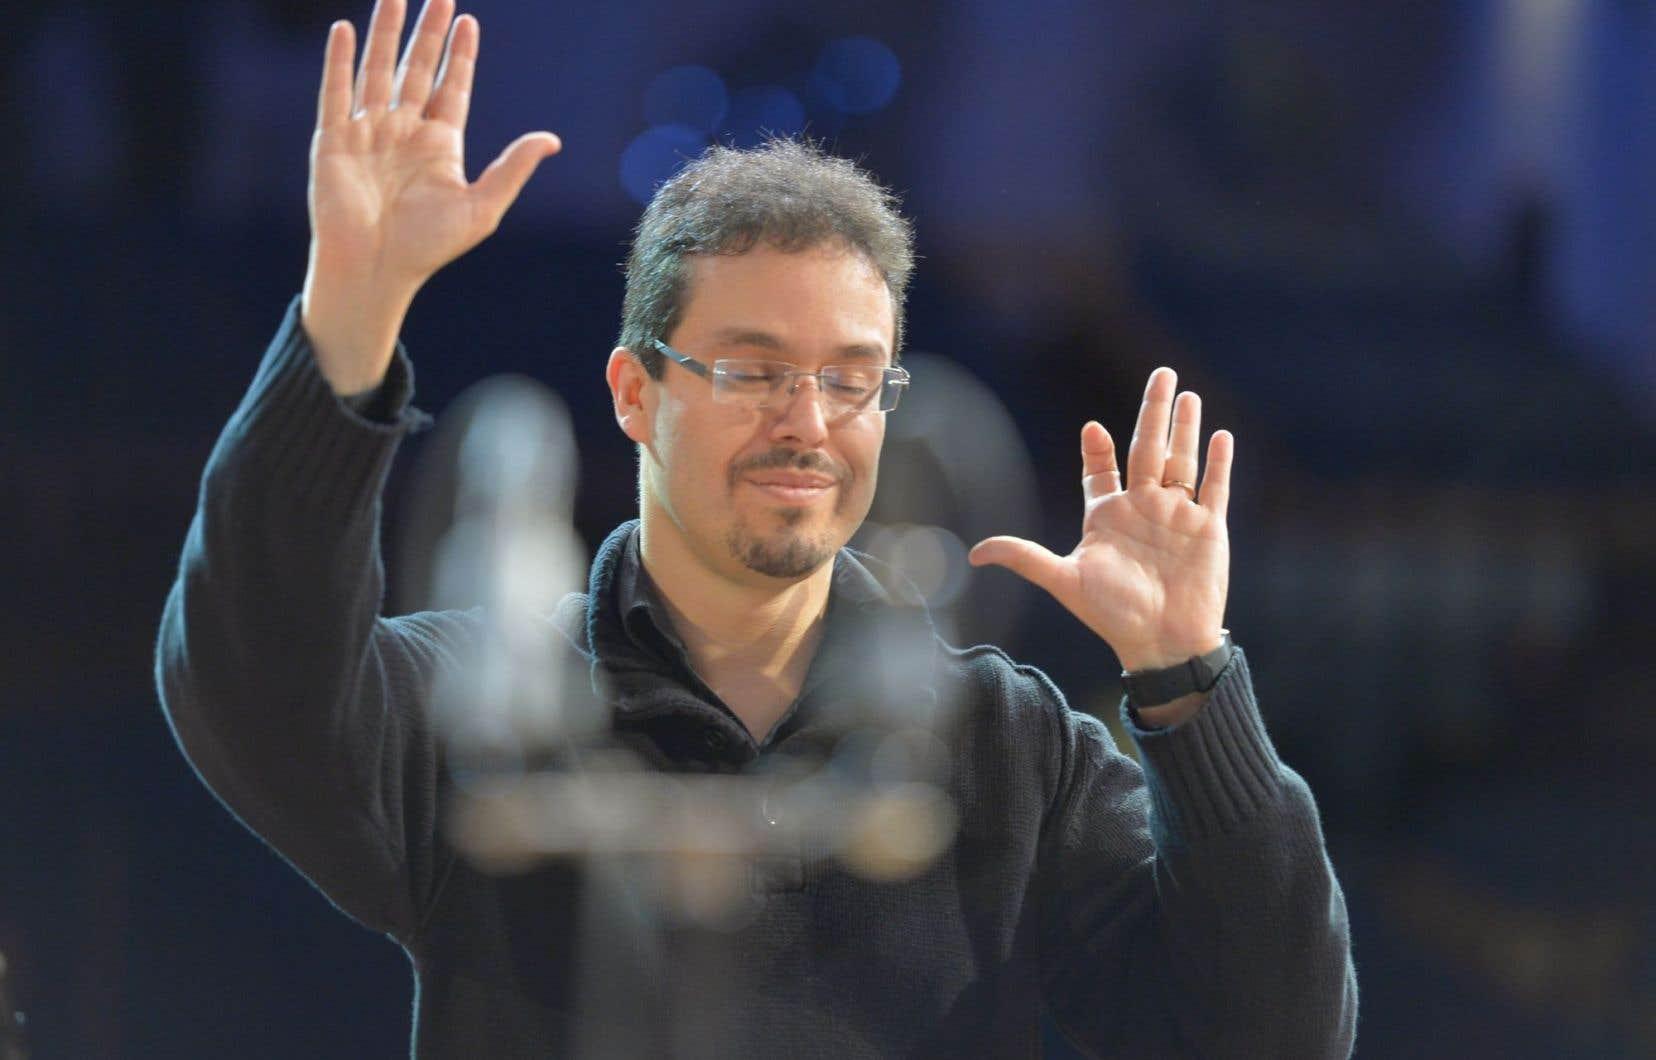 Le chef d'orchestre argentin, Leonardo García Alarcón